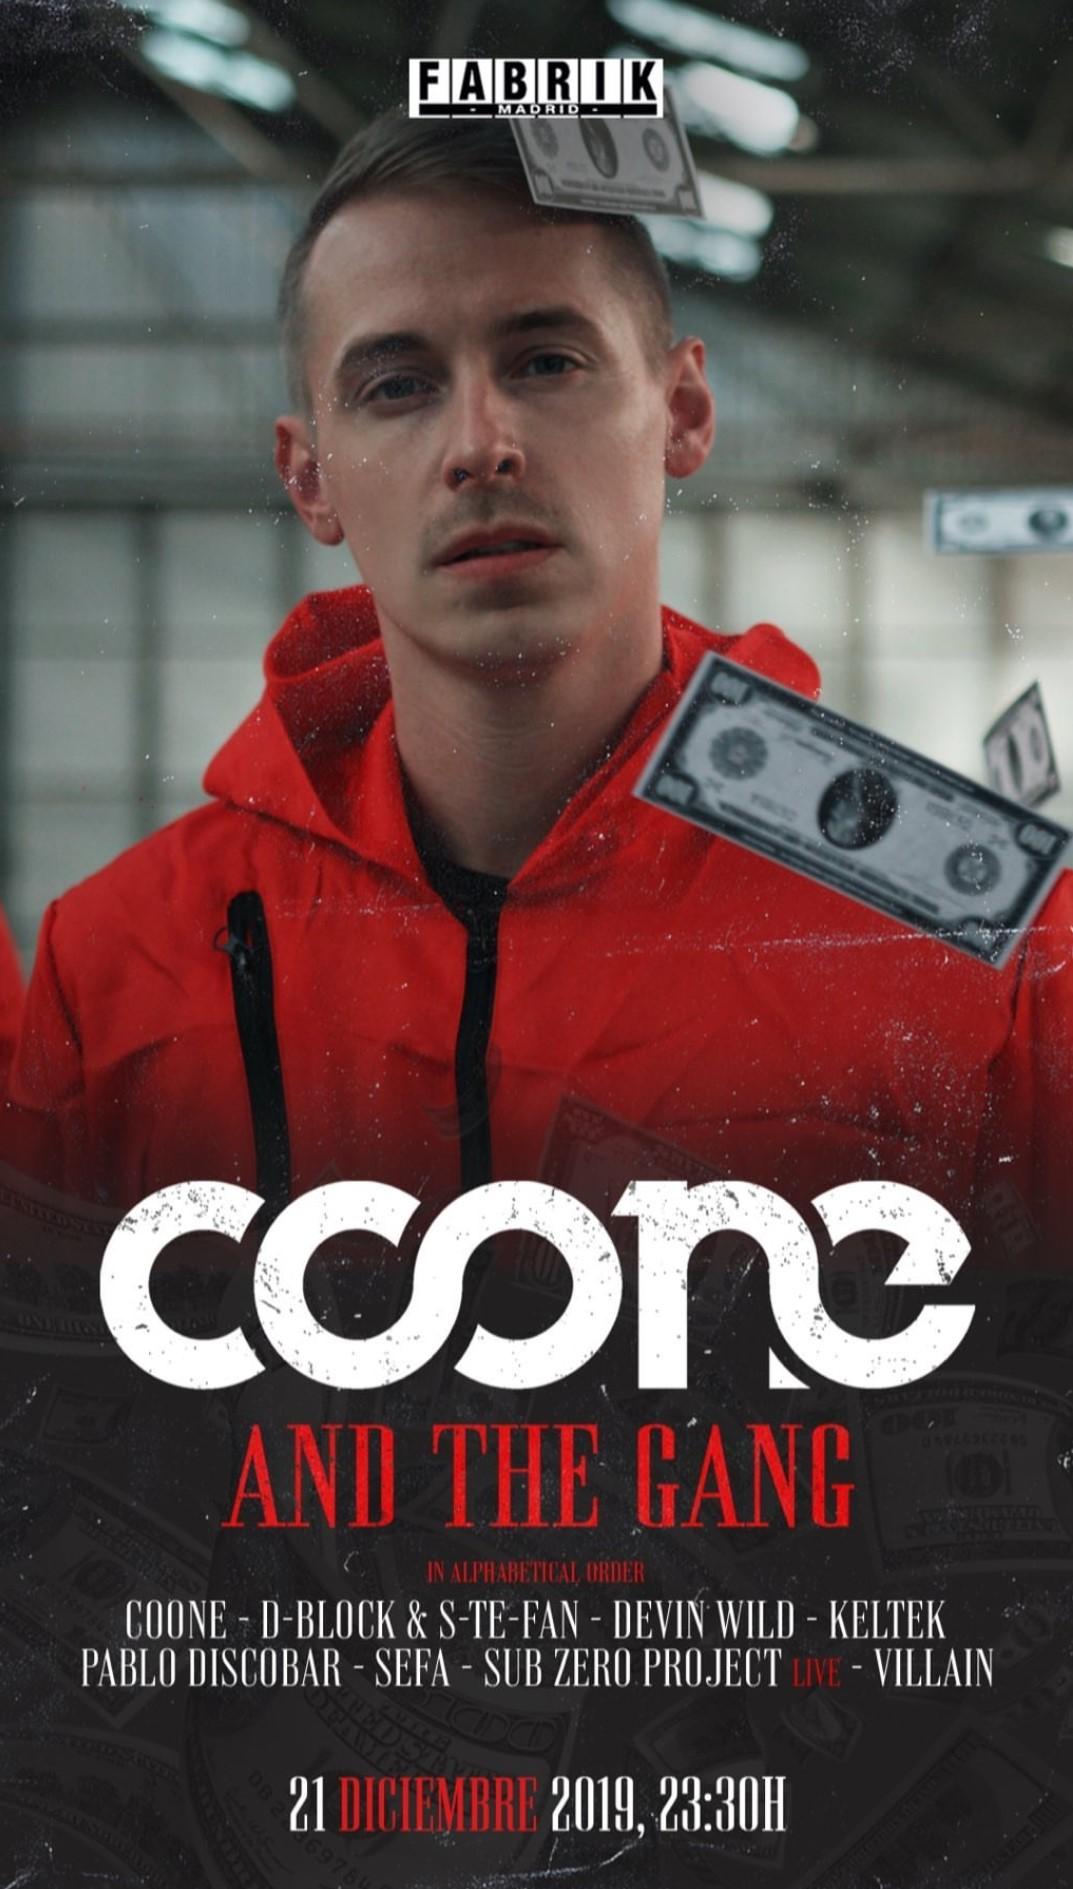 FABRIK - Coone & The Gang